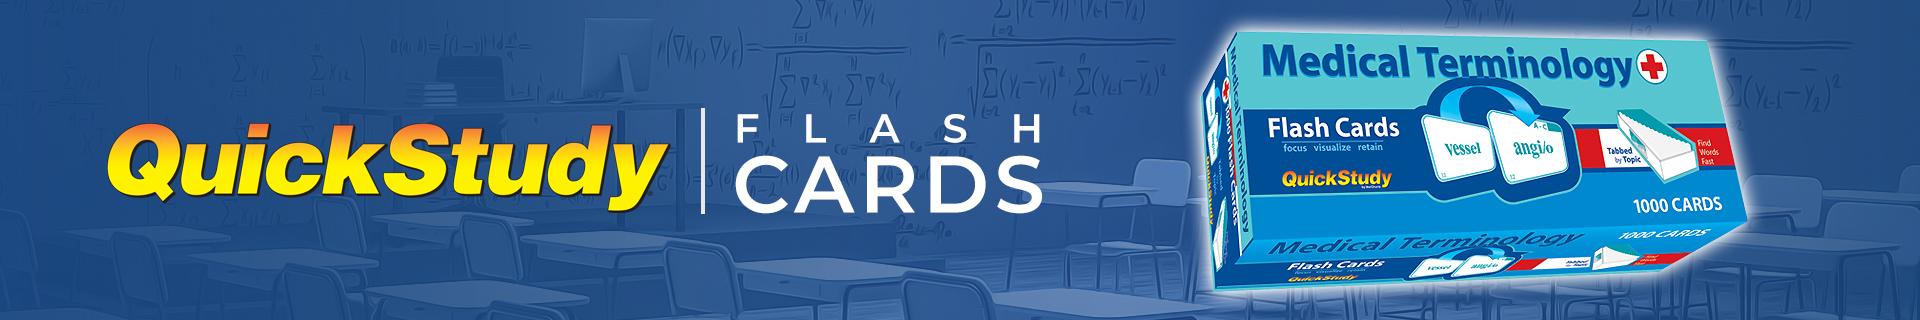 flashcards-pagebanner.jpg